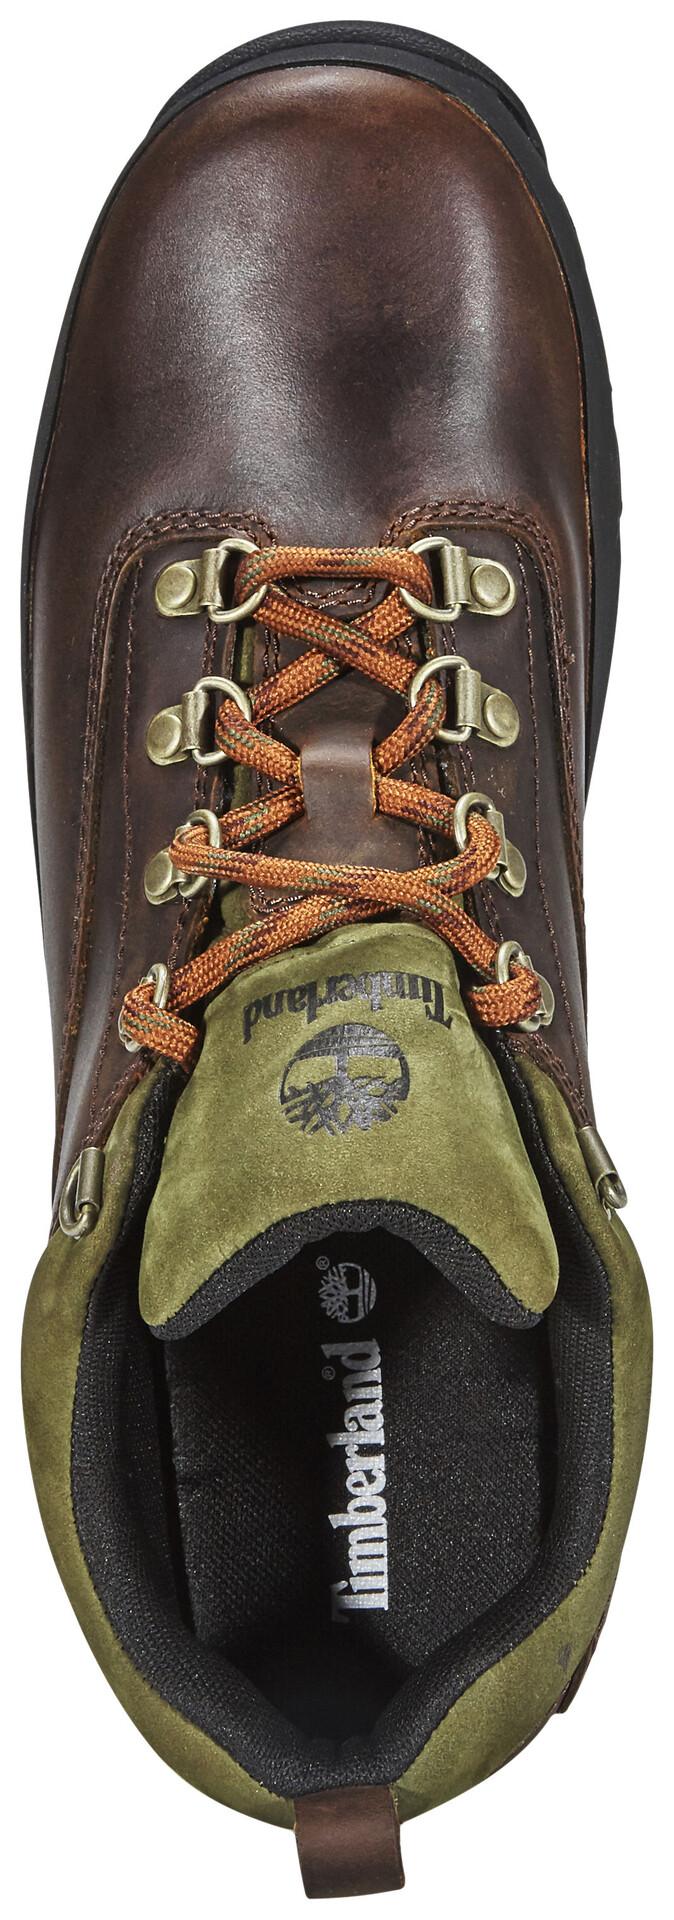 Campz Chaussures Marron Euro Homme Low Hiker Timberland Sur qPZB0w